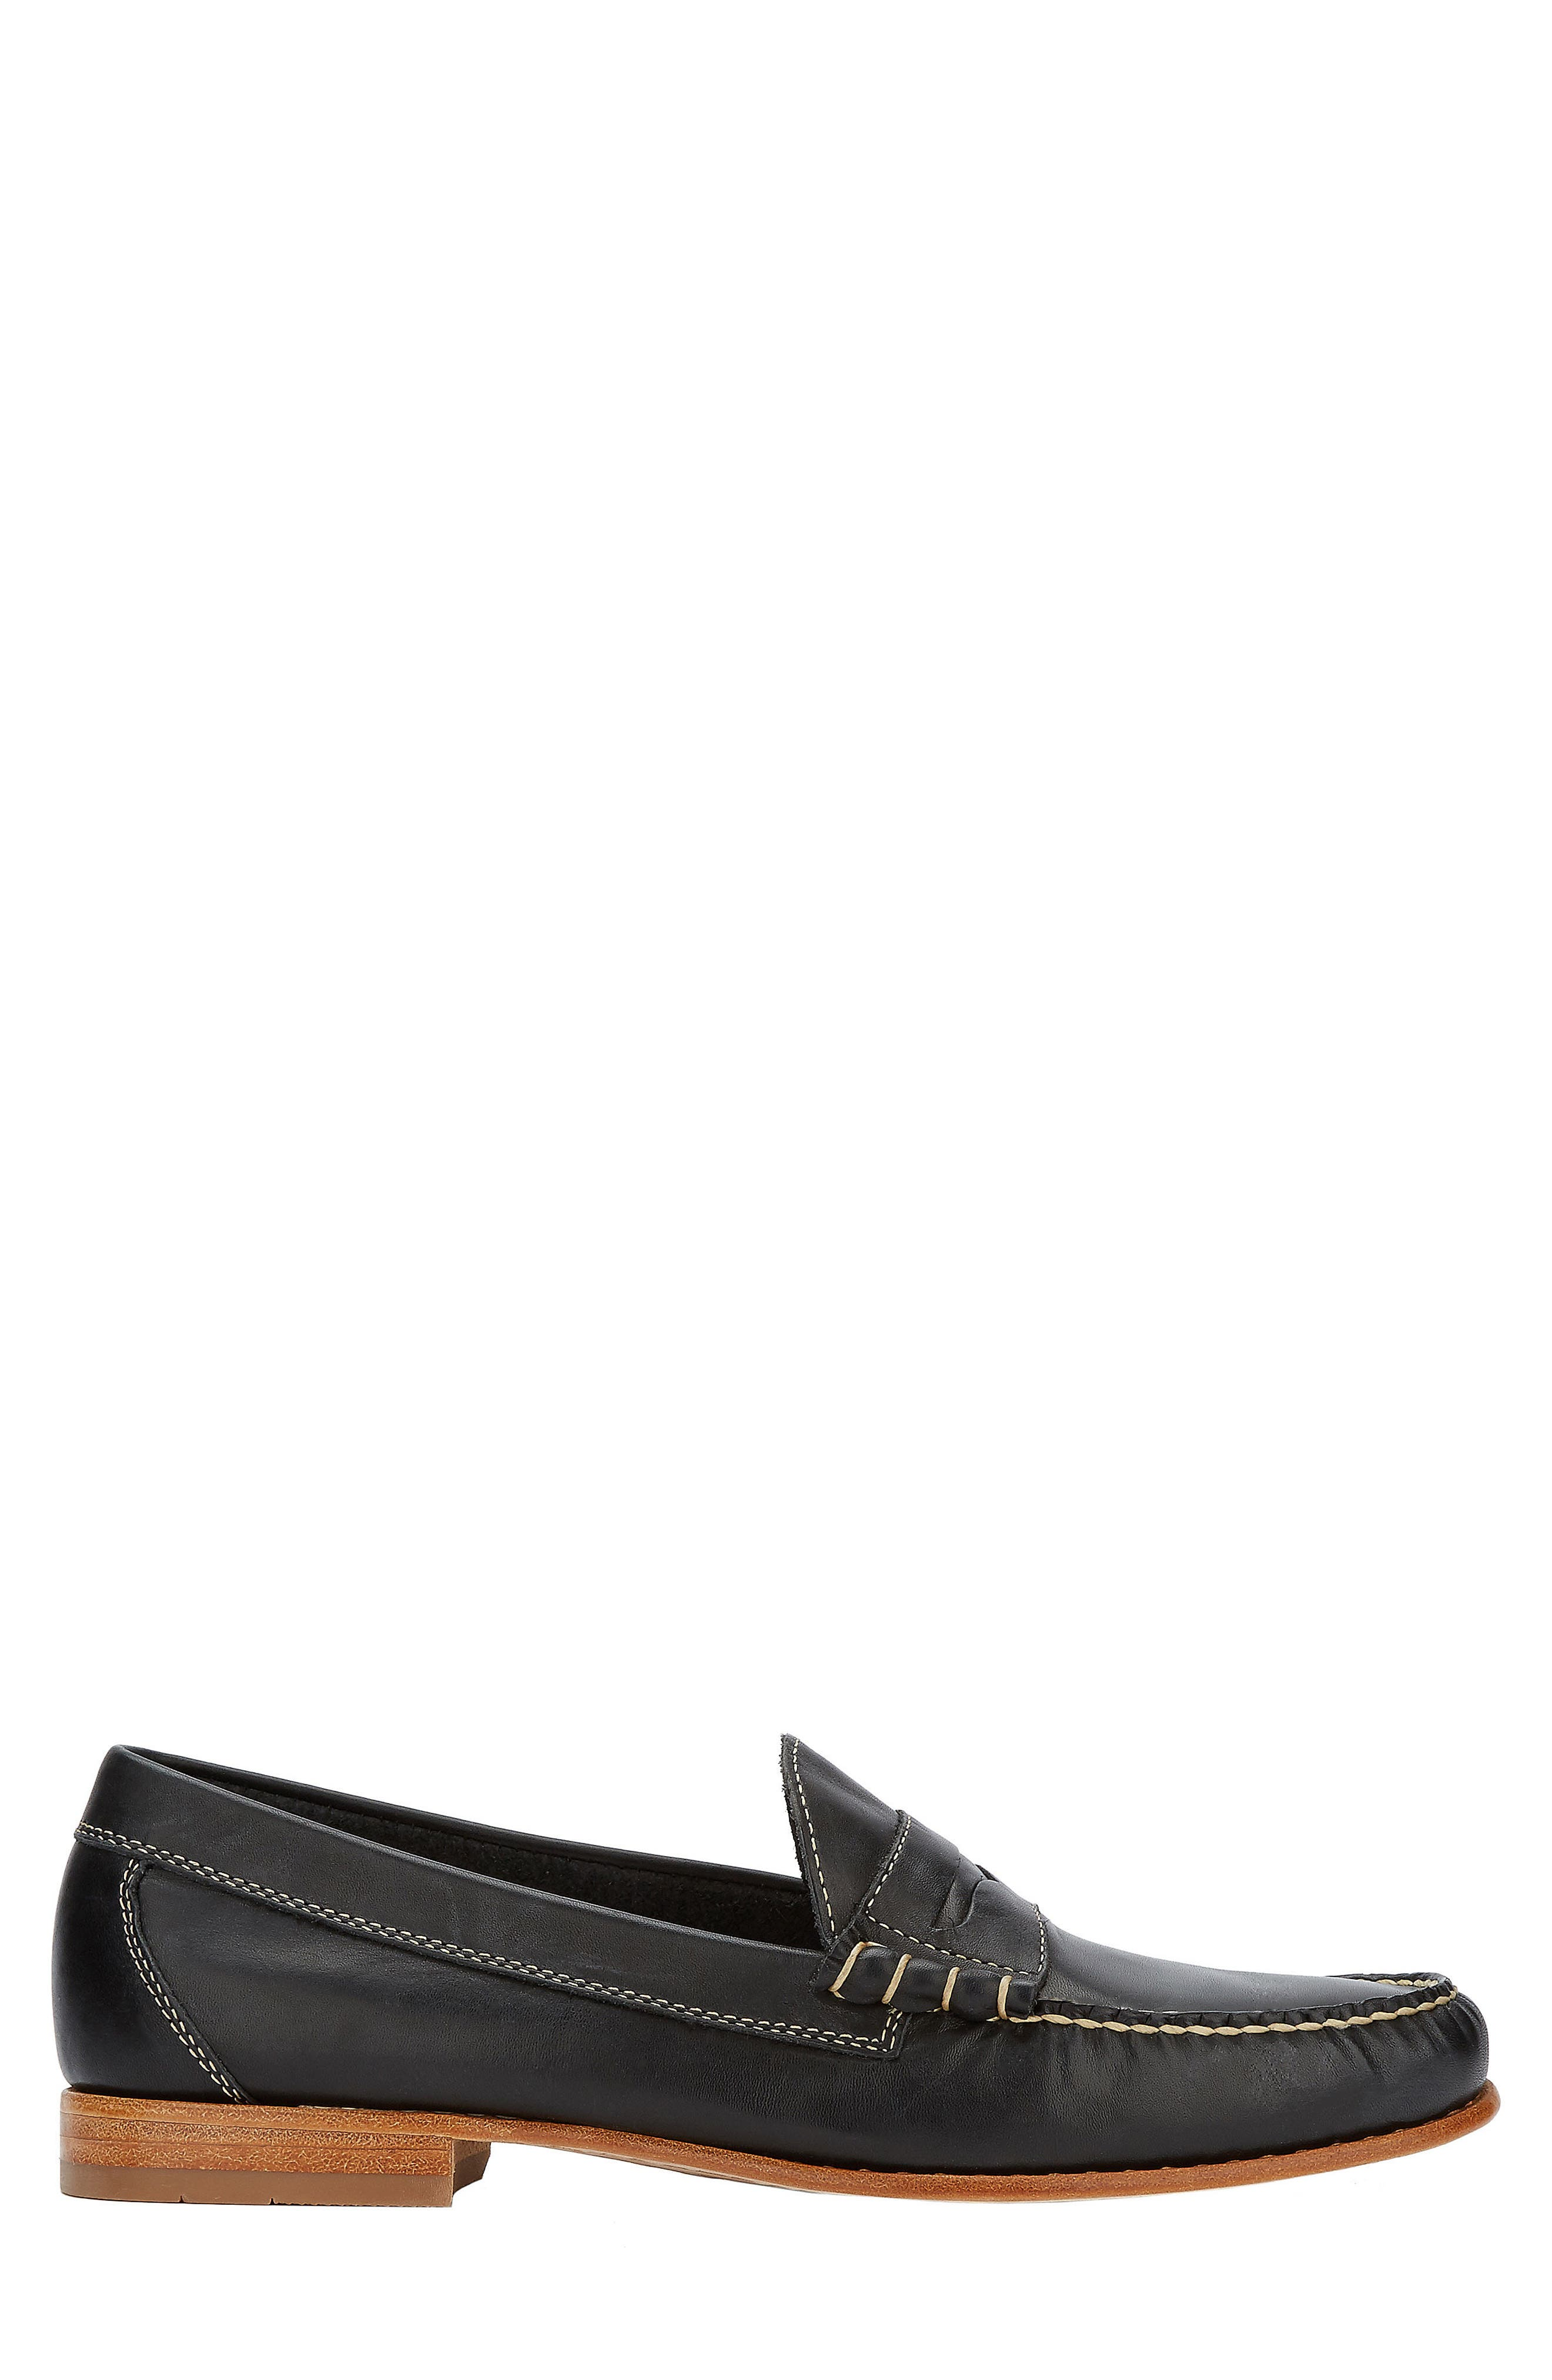 Weejuns Lambert Penny Loafer,                             Alternate thumbnail 3, color,                             Black